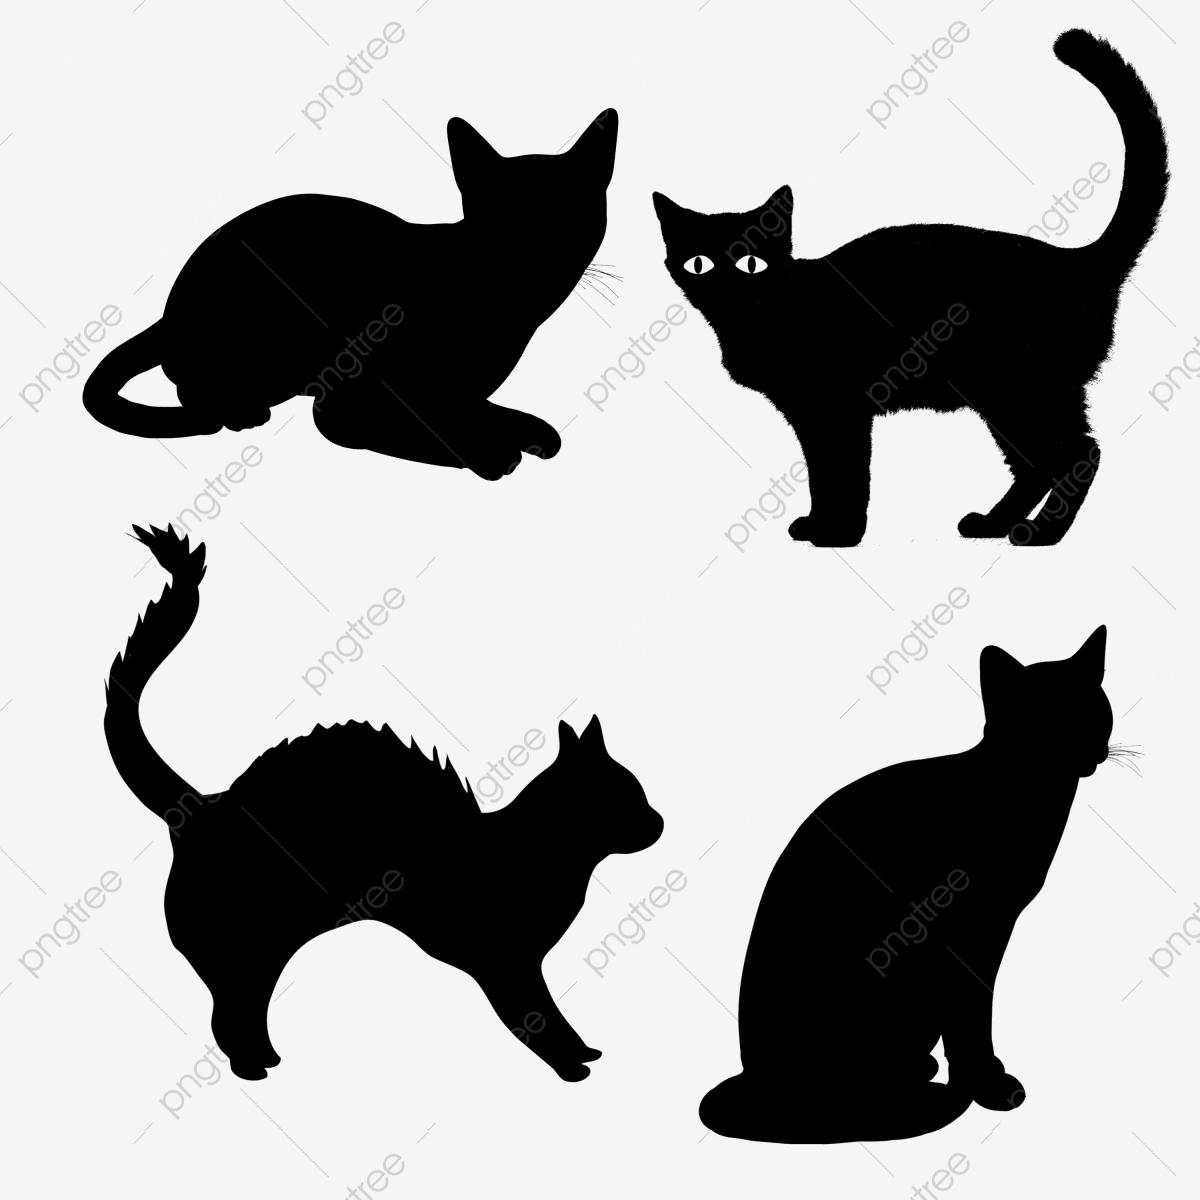 Halloween Cats Clipart Elements, Png, Cats, Clipart PNG Transparent.